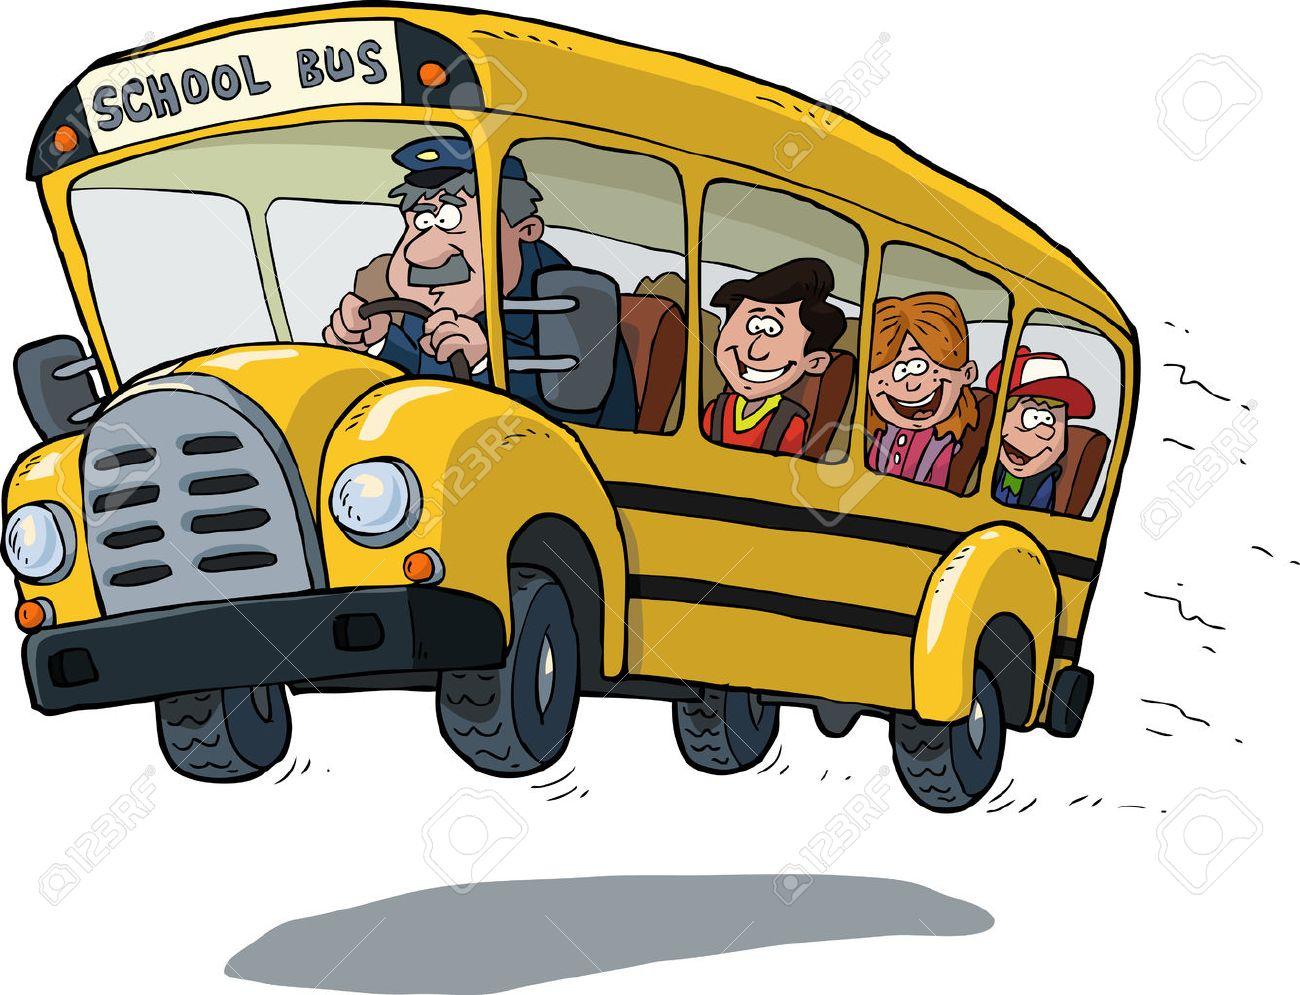 School bus on white background vector illustration - 47183720